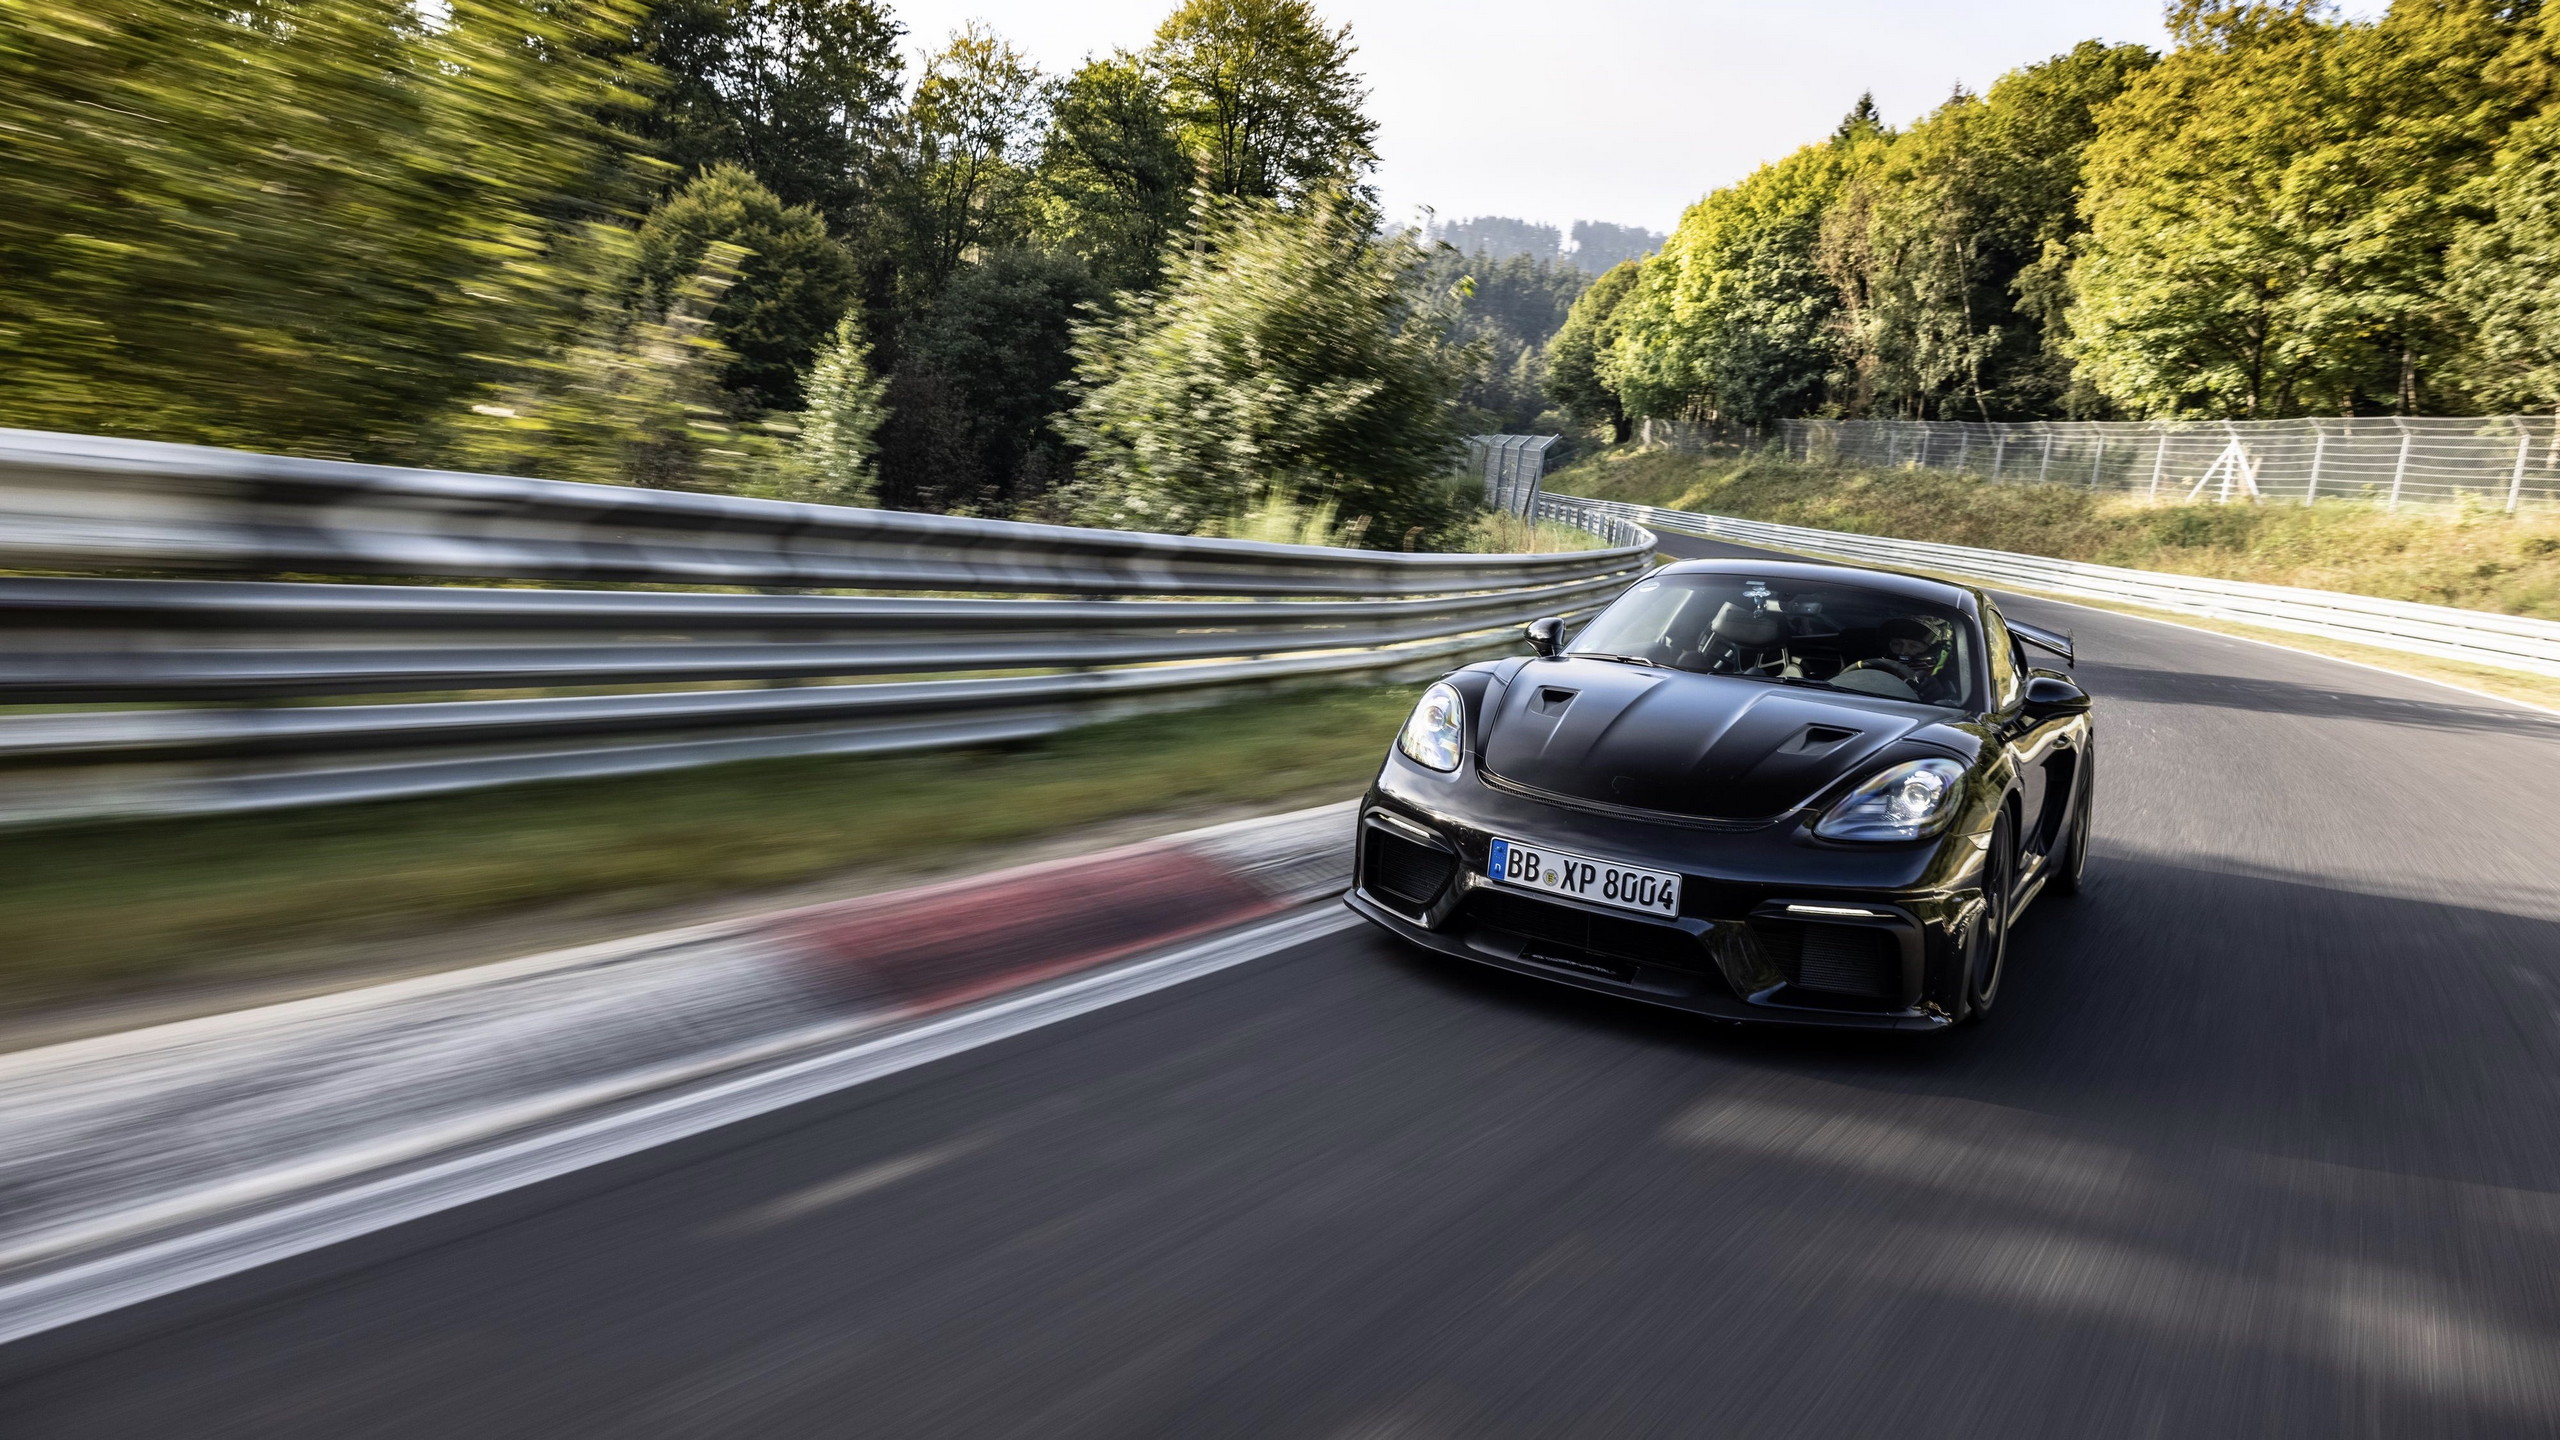 Porsche 718 Cayman GT4 RS Nürburgring'e ayak bastı